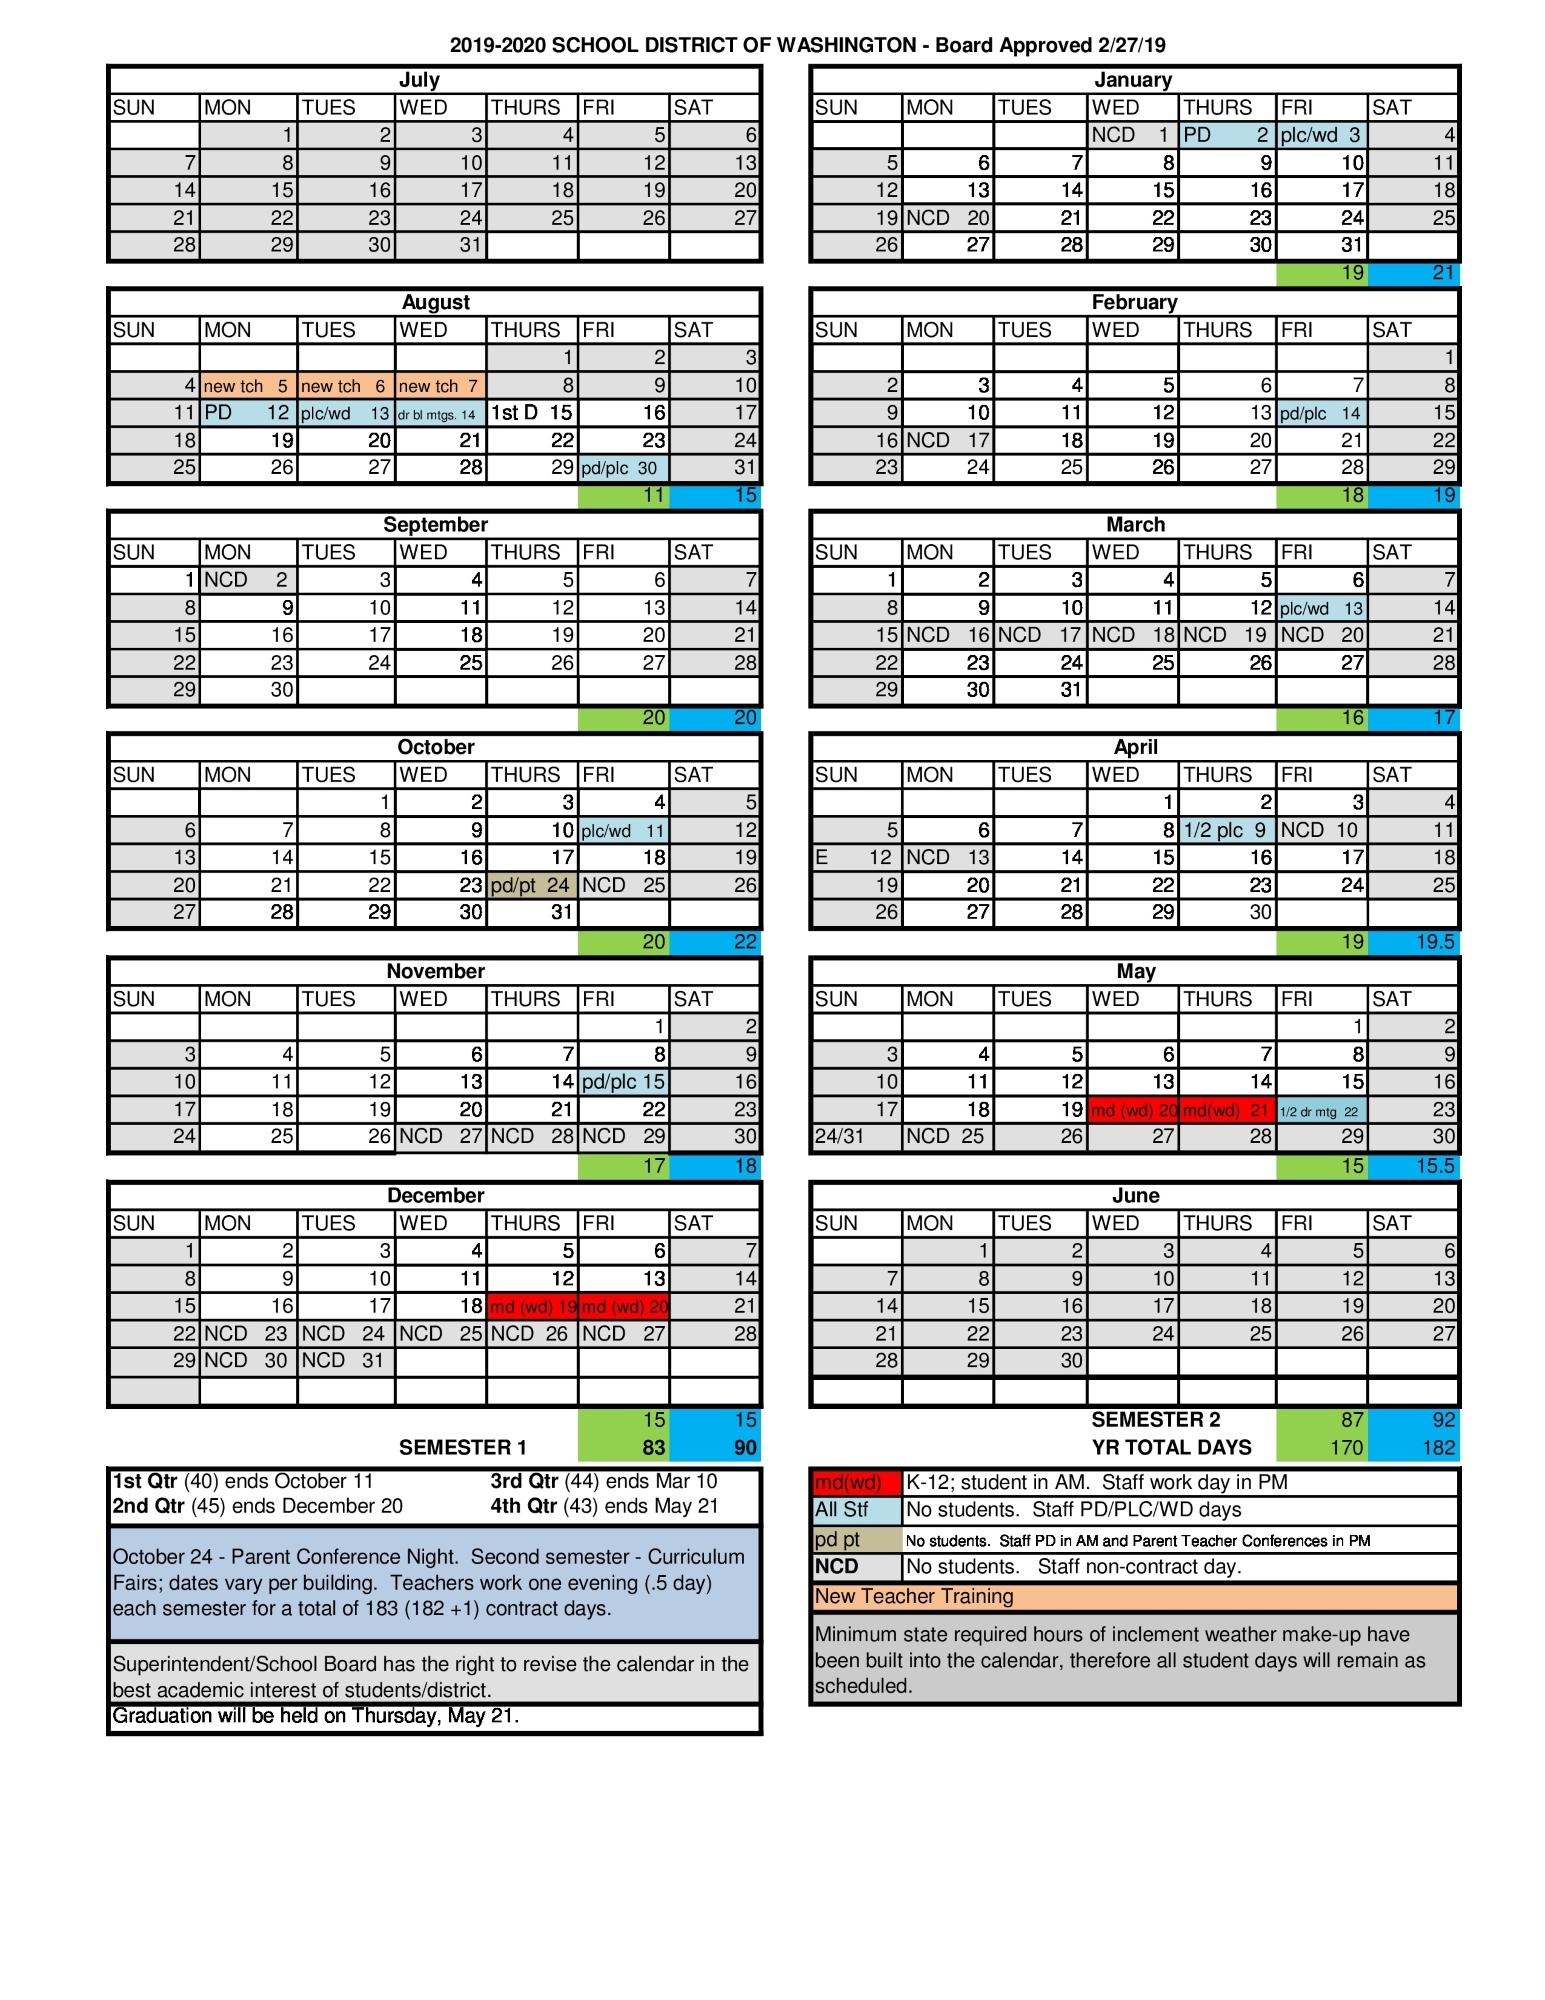 Academic Calendar Information  School District Of Washington throughout Augusta County School Calendar